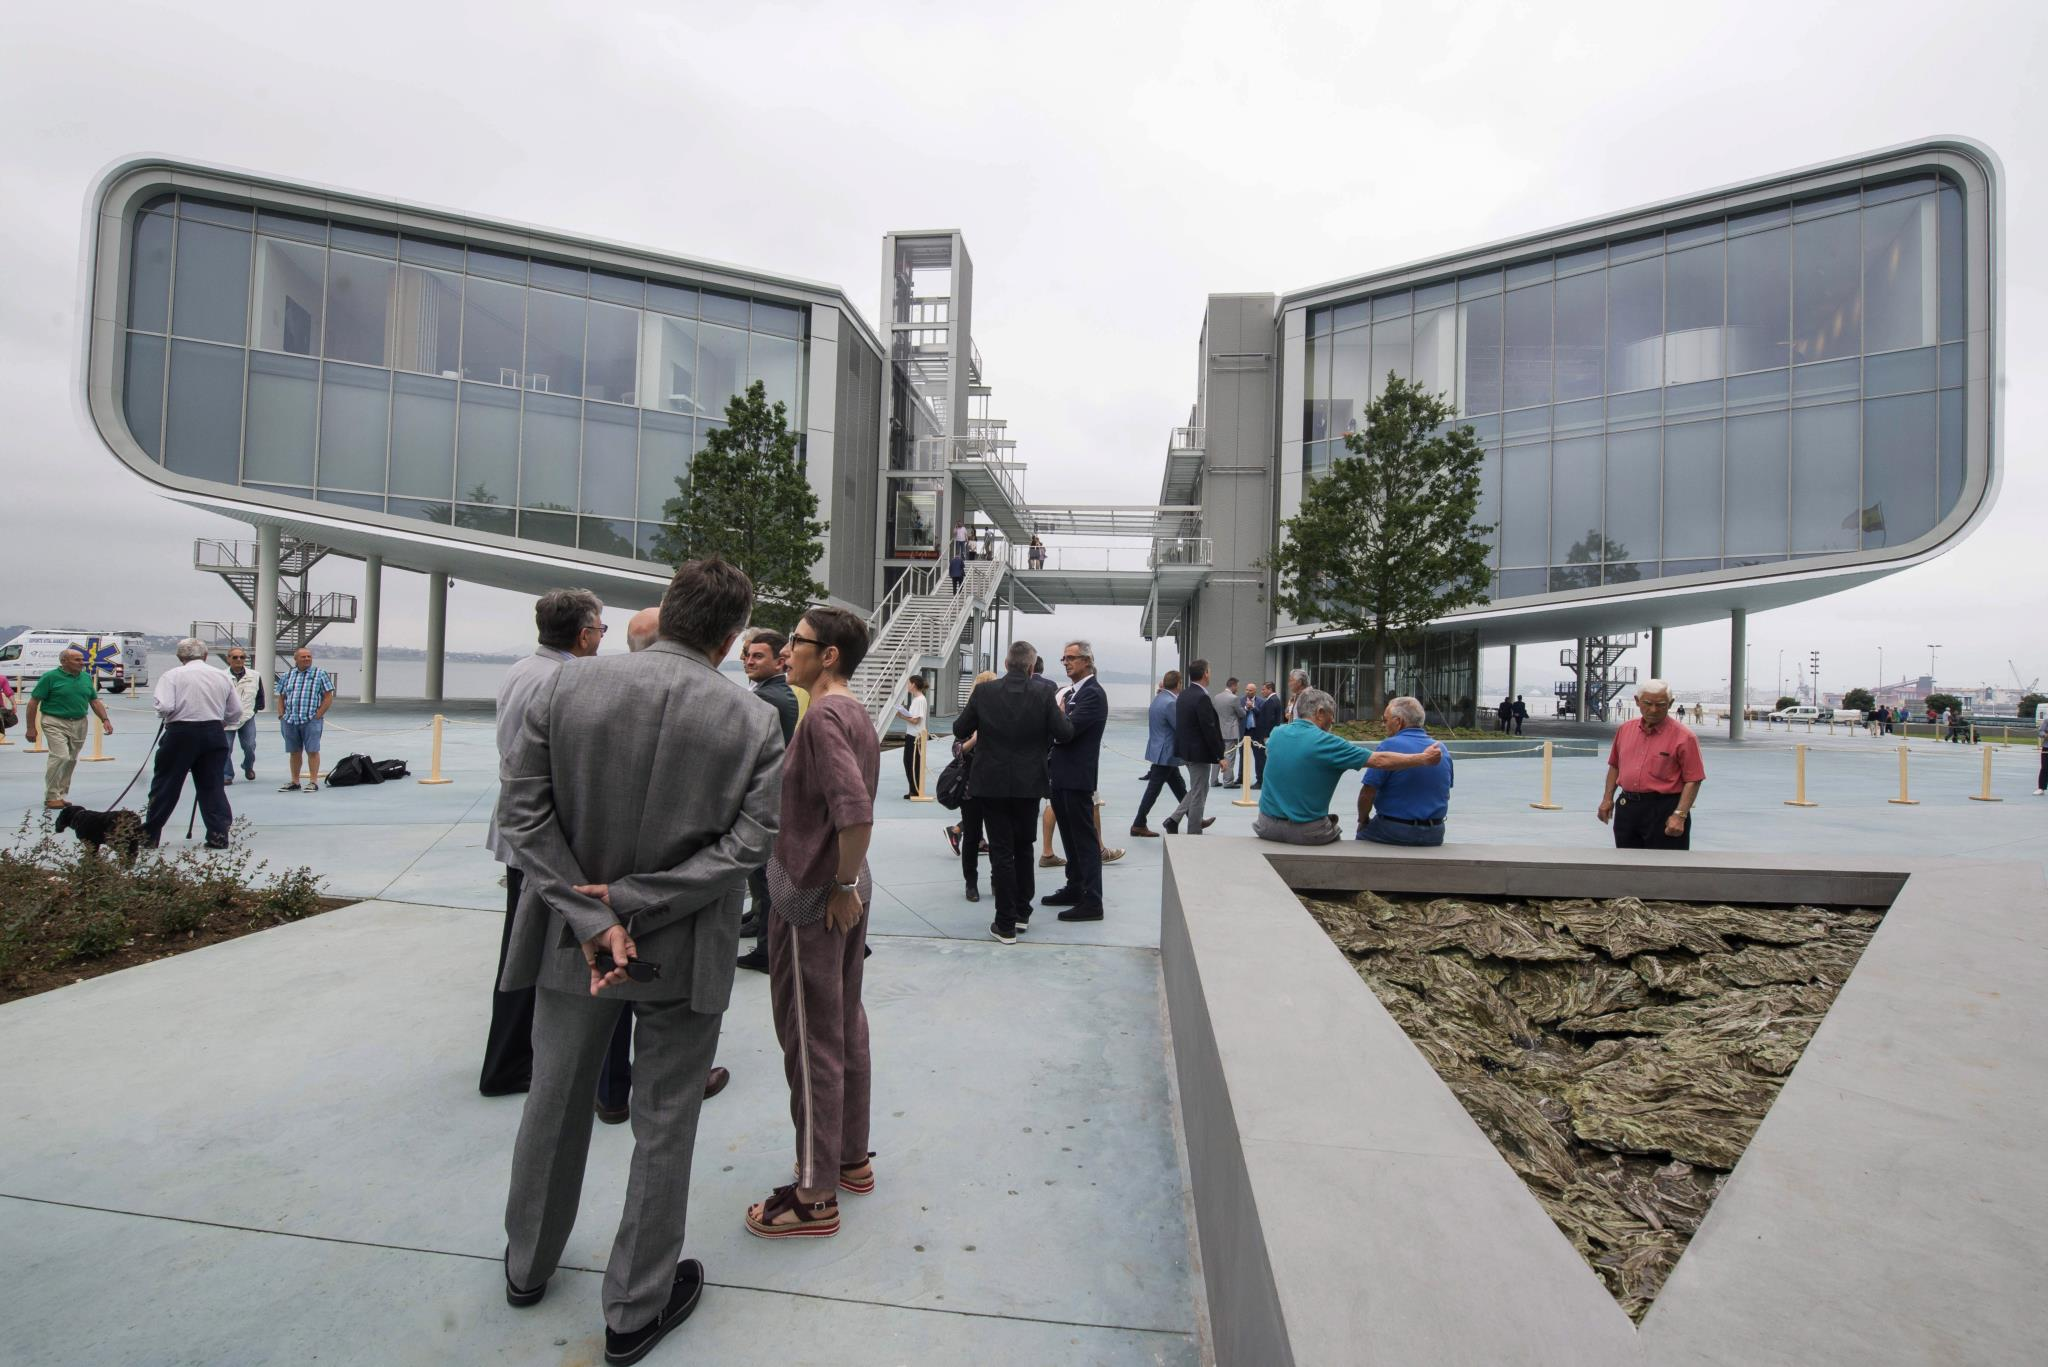 PÚBLICO - Santander inaugura centro de artes desenhado por Renzo Piano